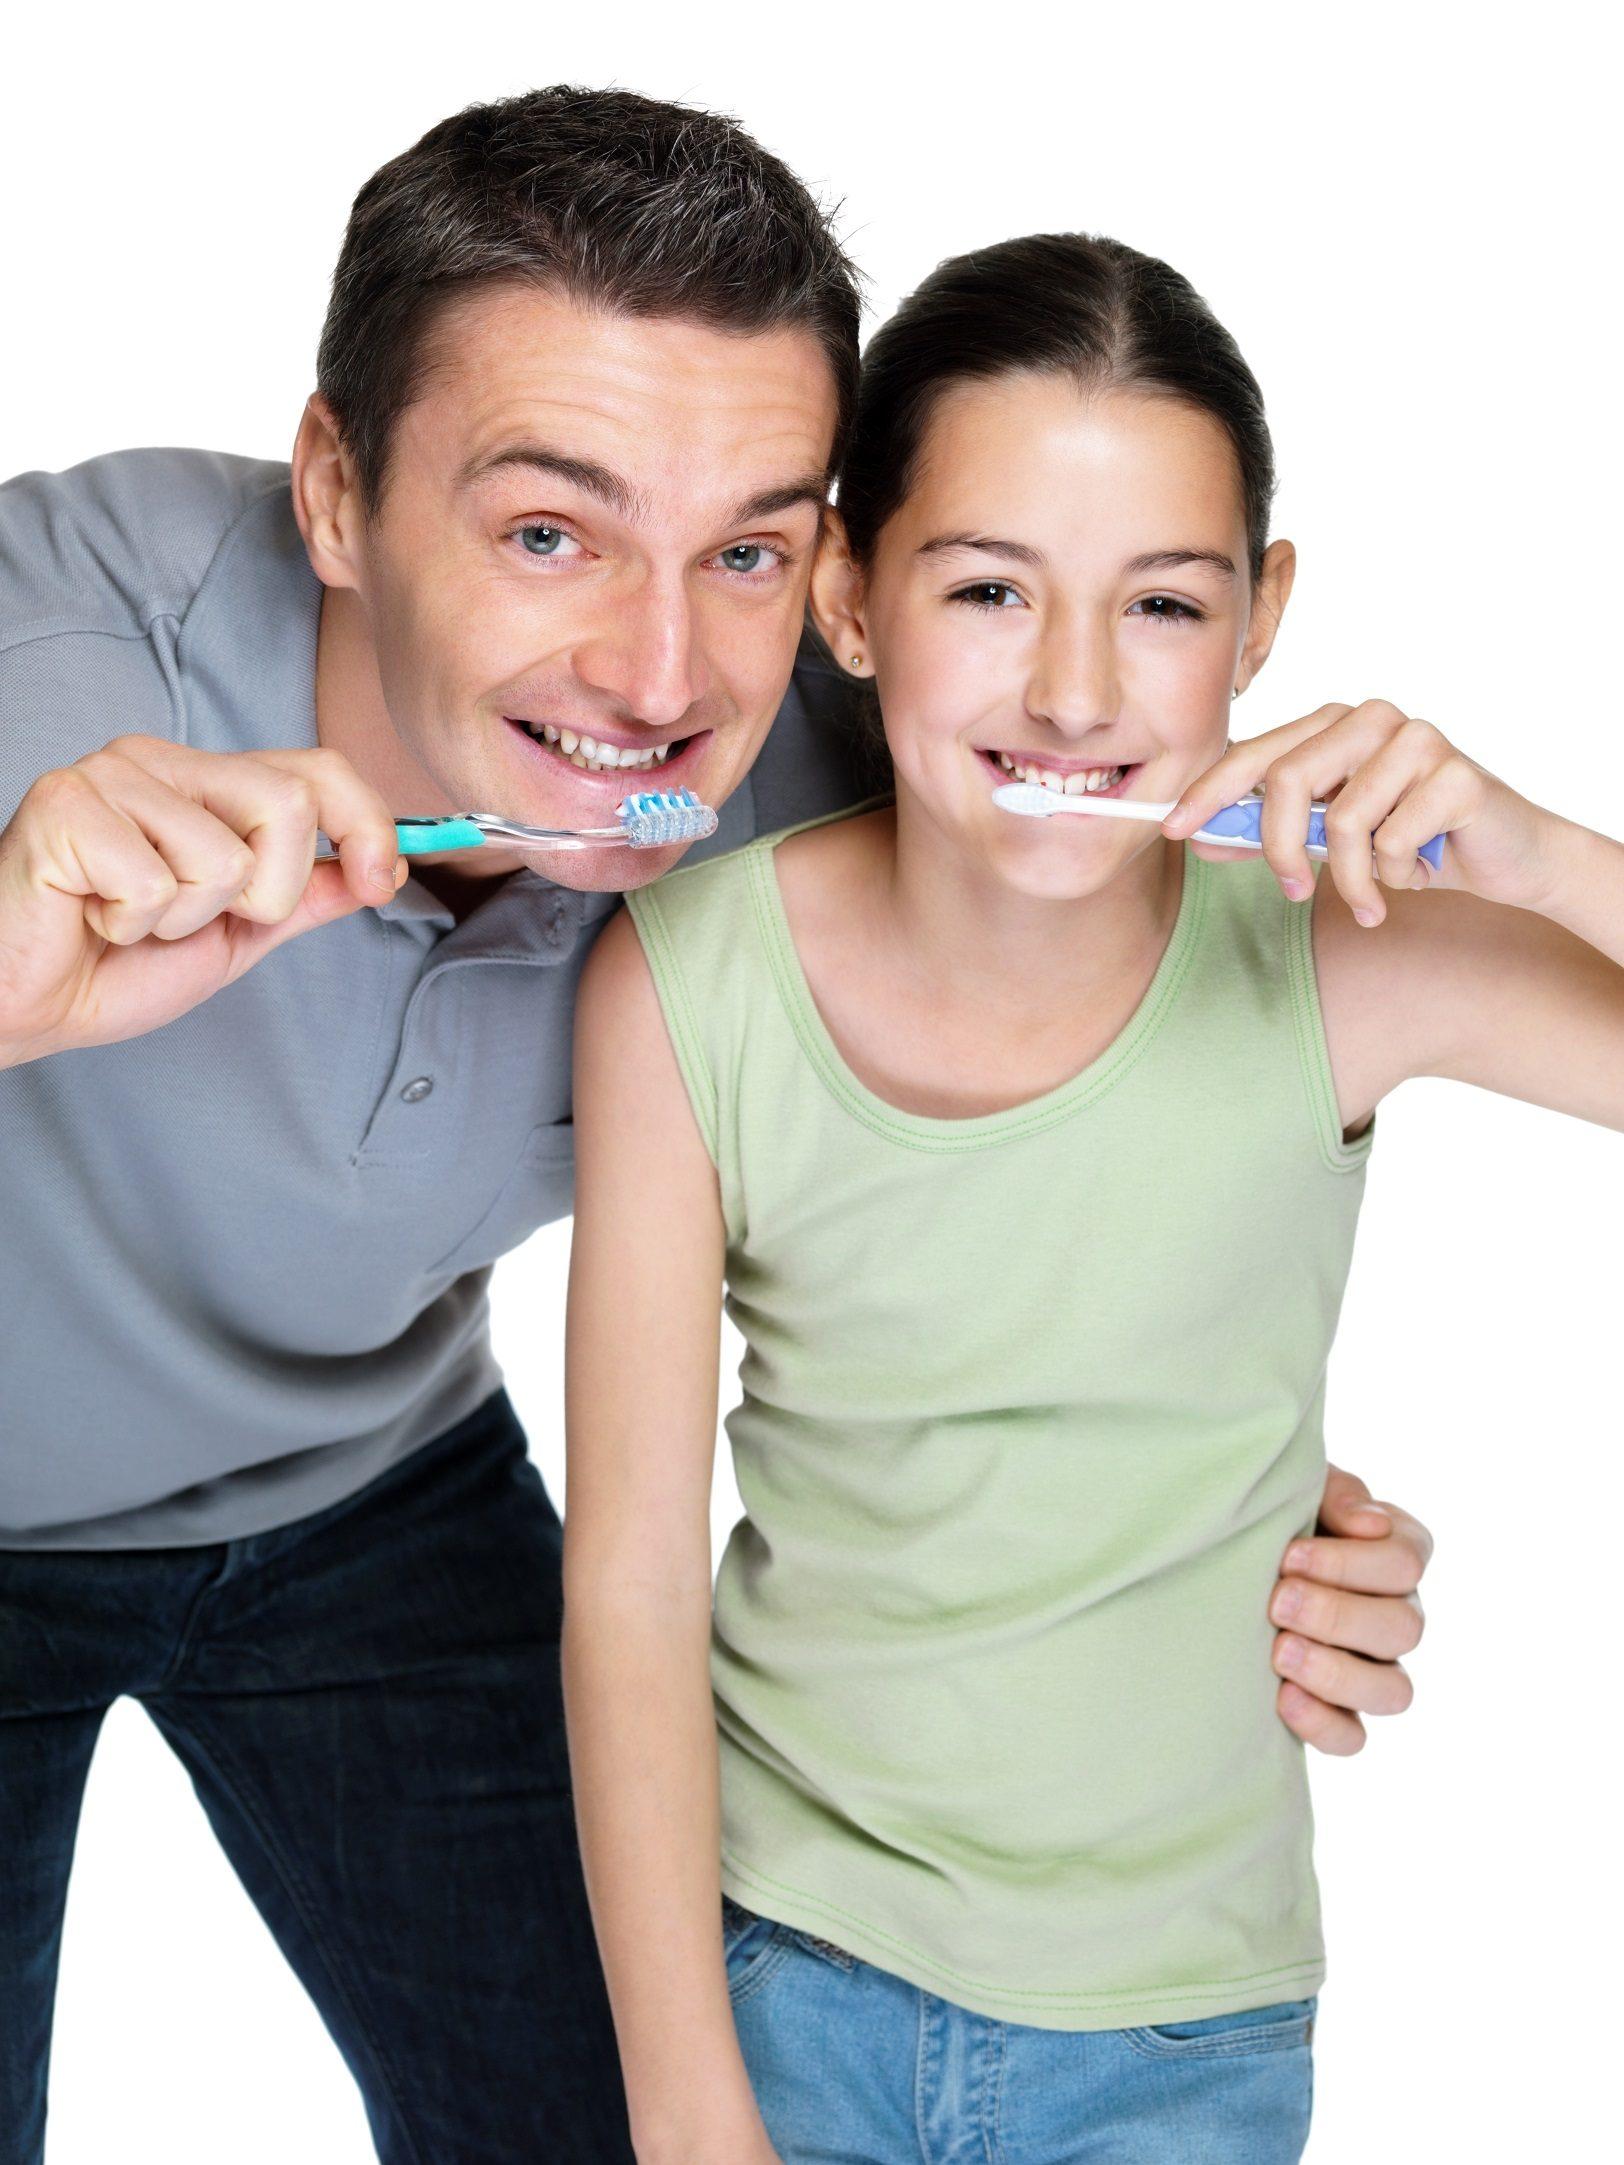 revisión dental en majadahonda